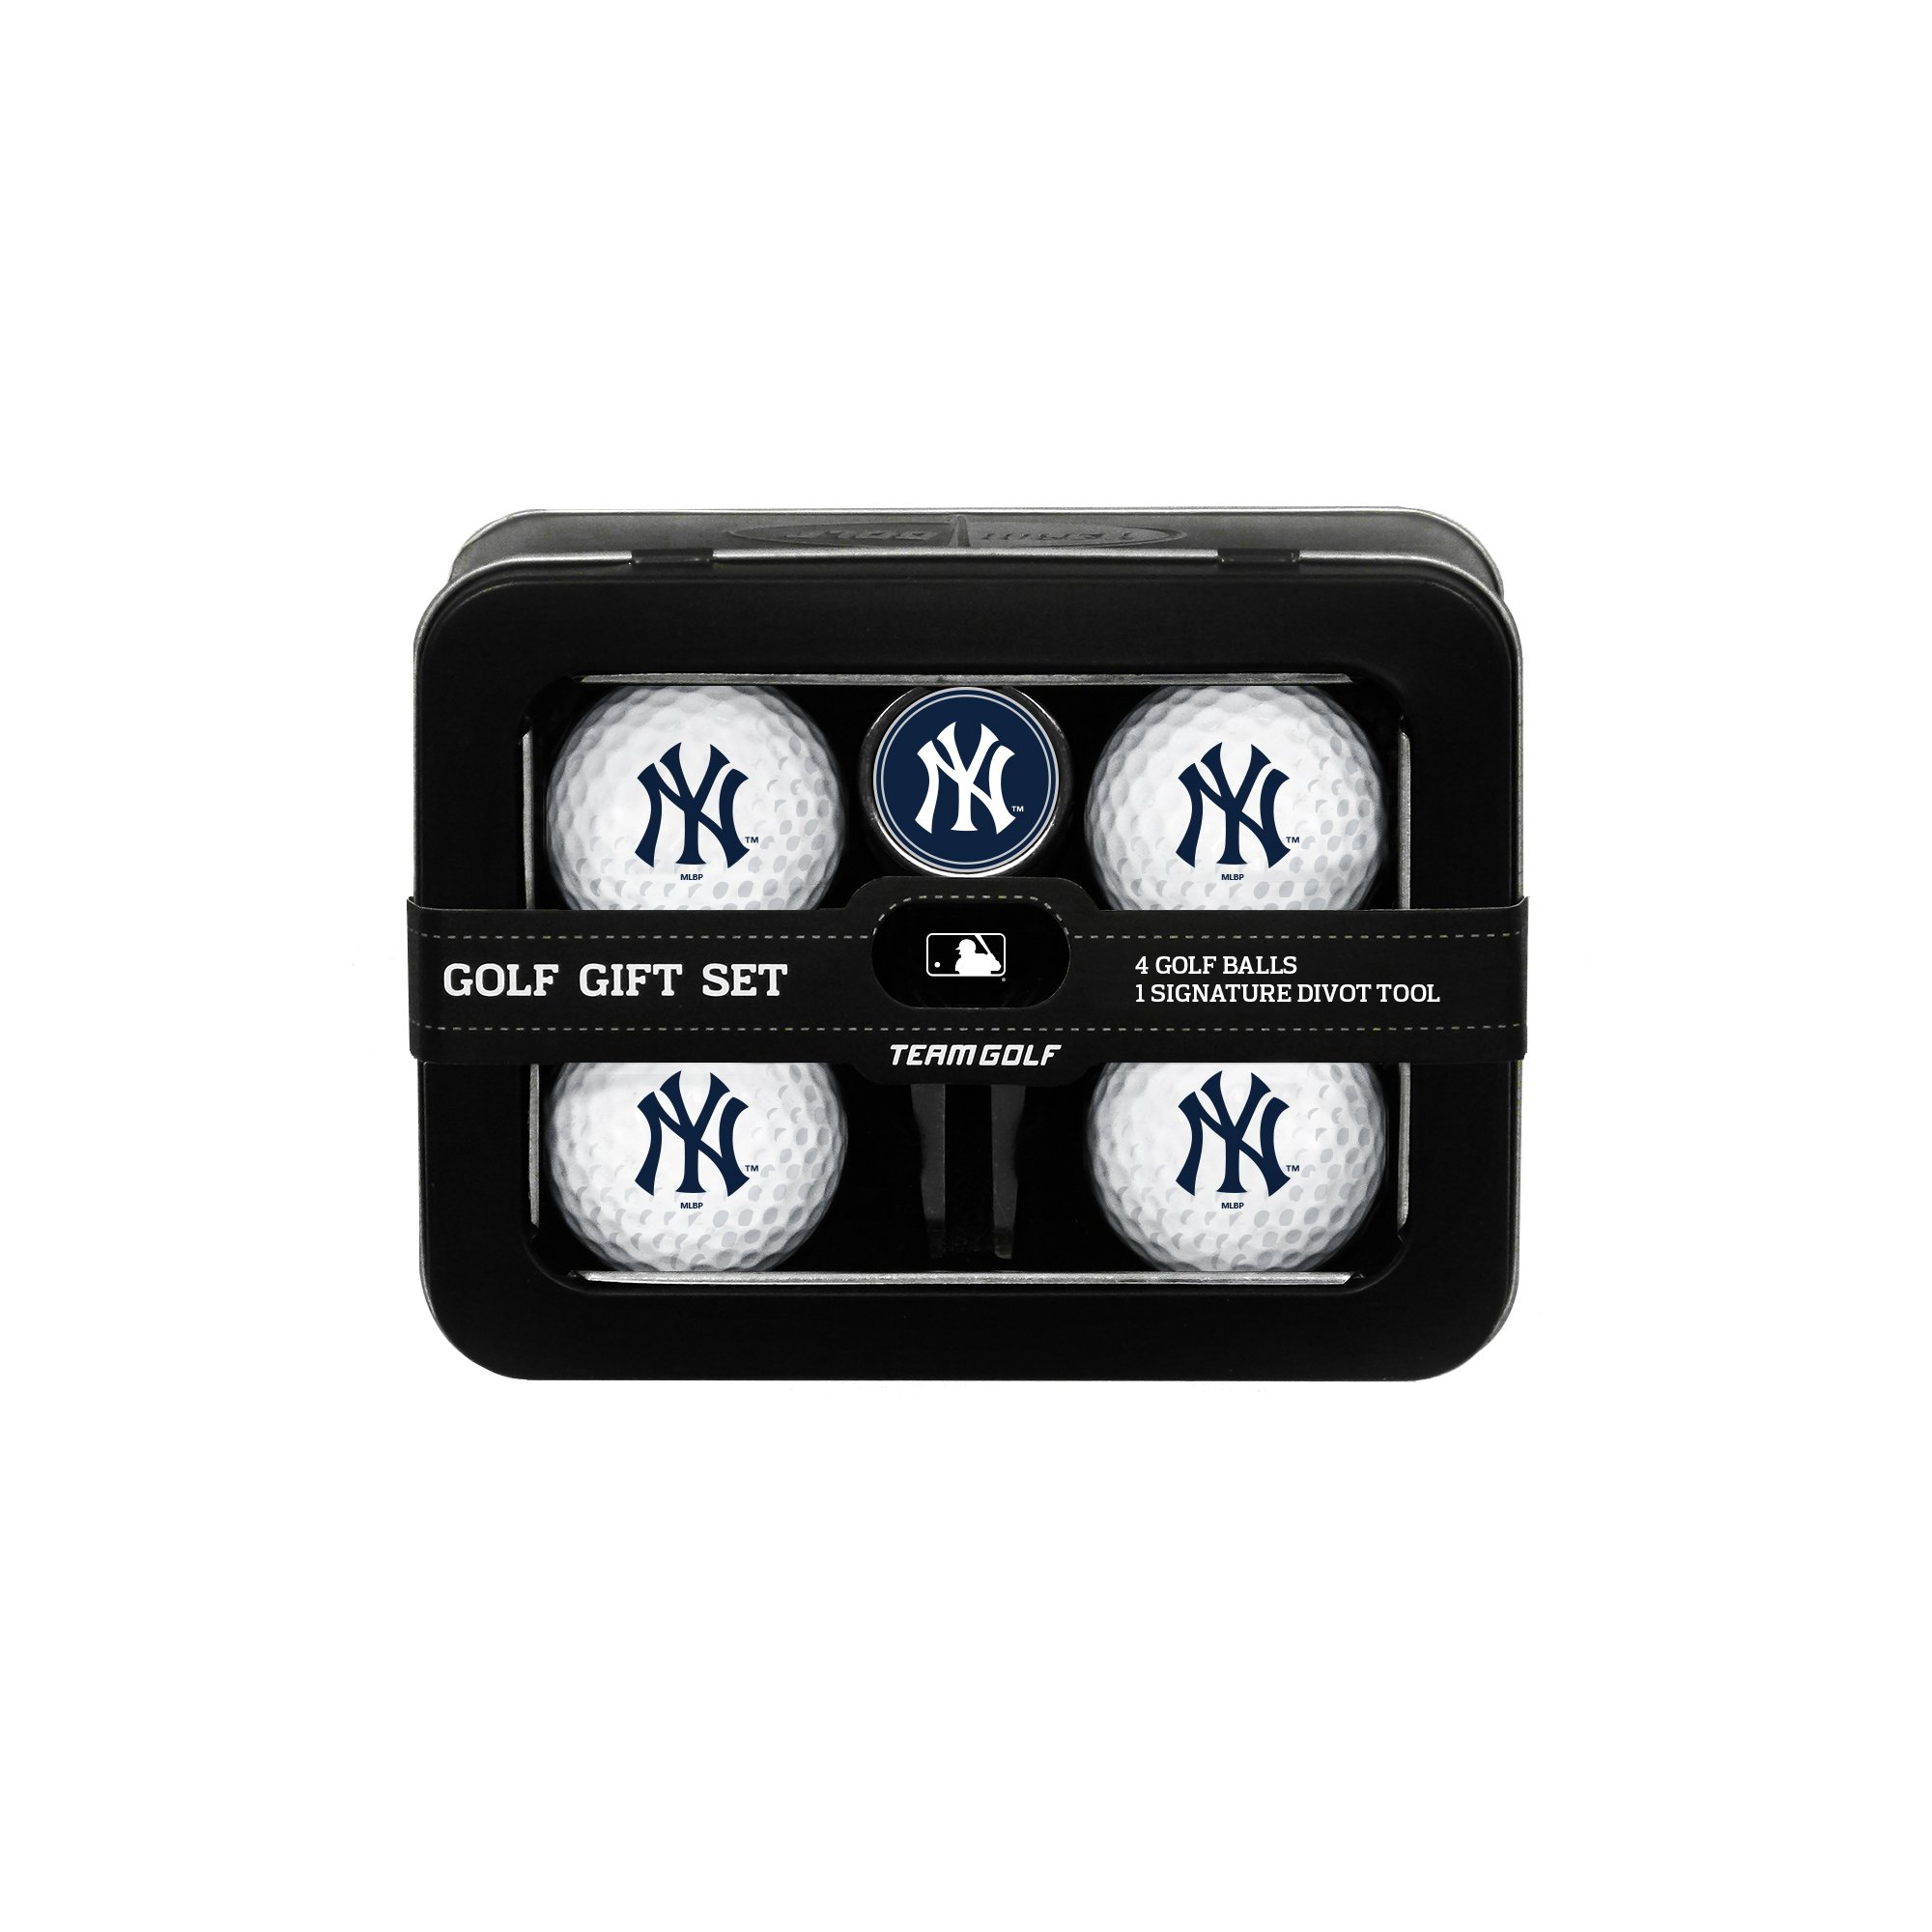 MLB New York Yankees 4 Golf Ball And Divot Tool Set by Team Golf